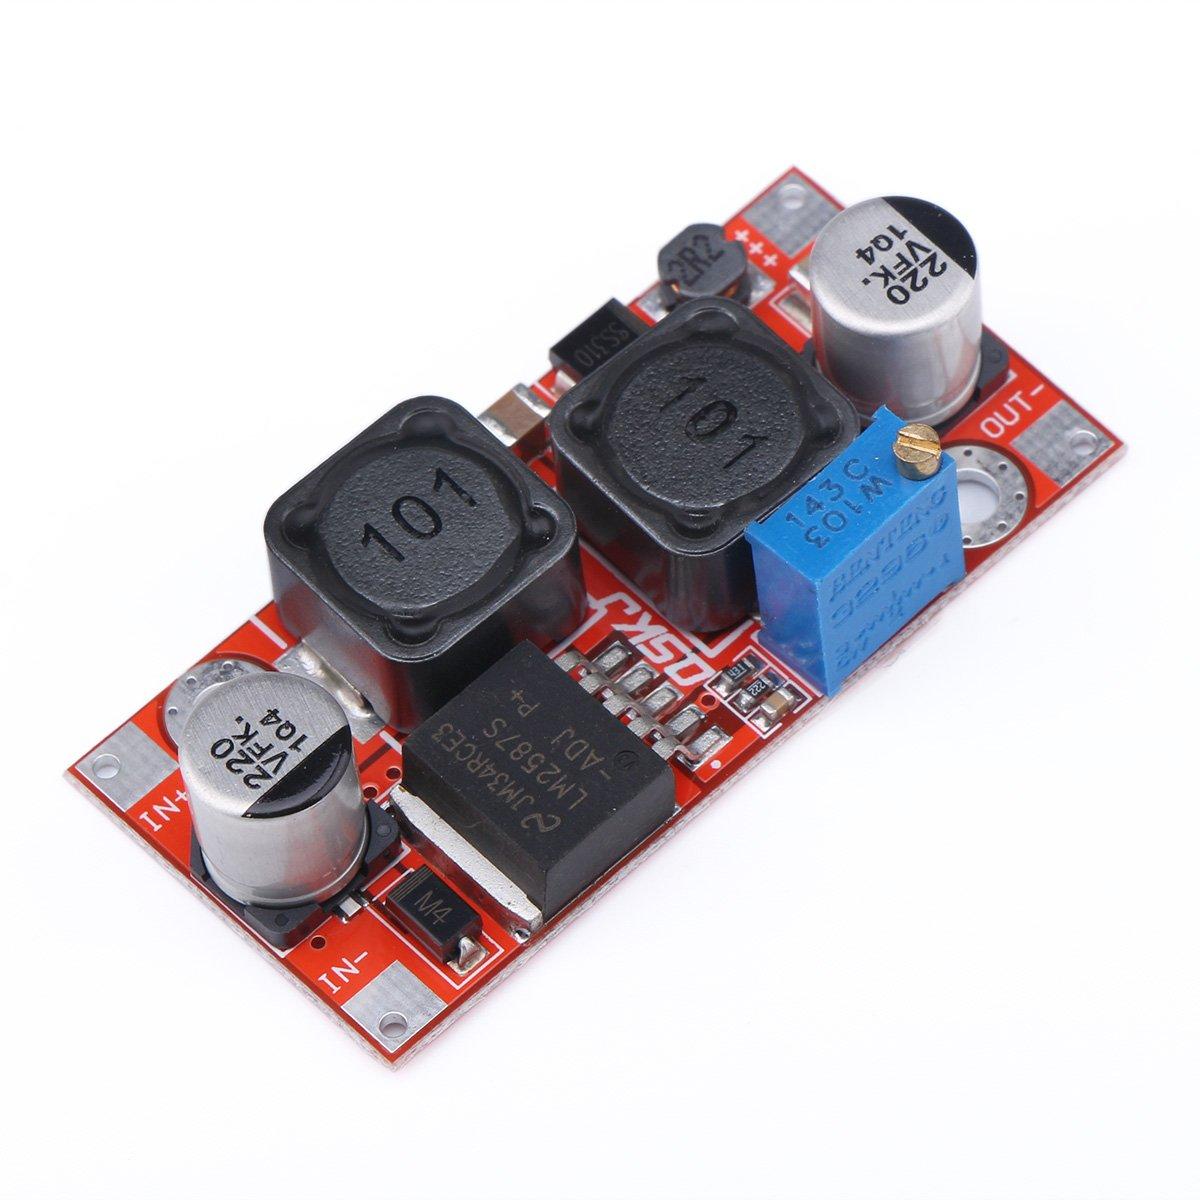 Drok Lm2587 Auto Step Up Down Converter Dc 5 35v Circuits Apmilifier 5v To 12v Lm2577 Voltage Electronics